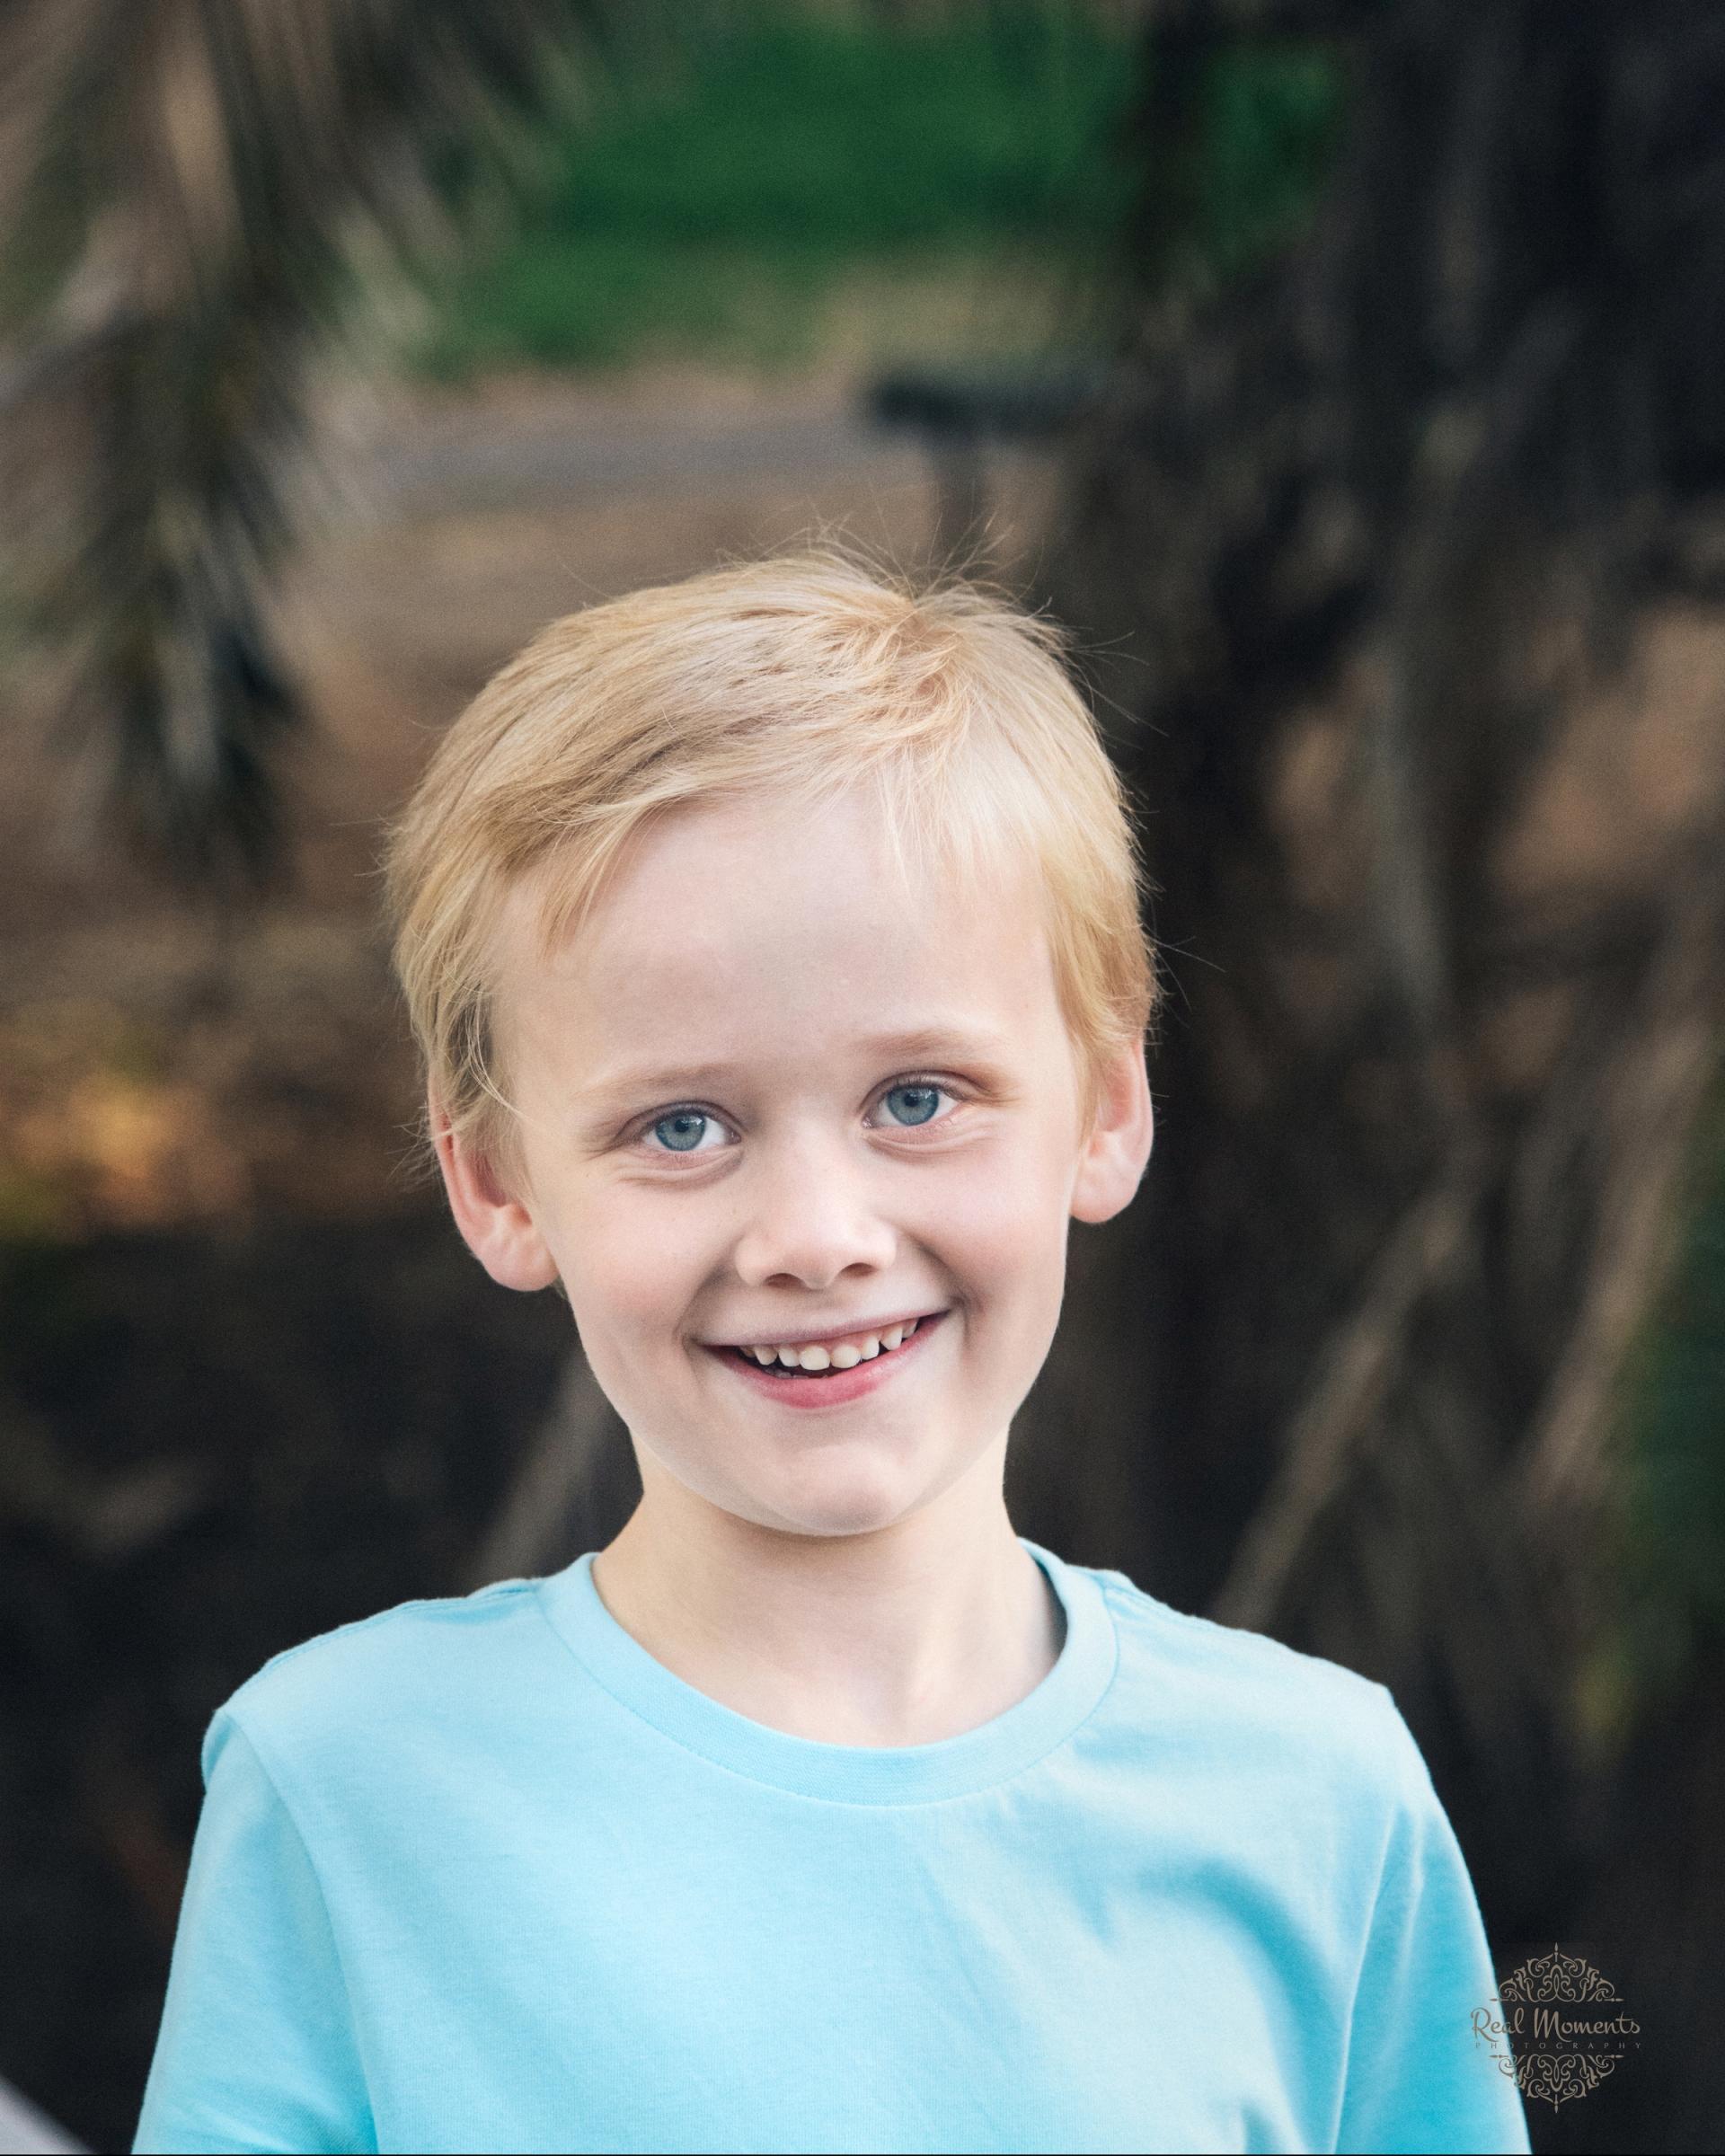 child photography - professional photographers Adelaide